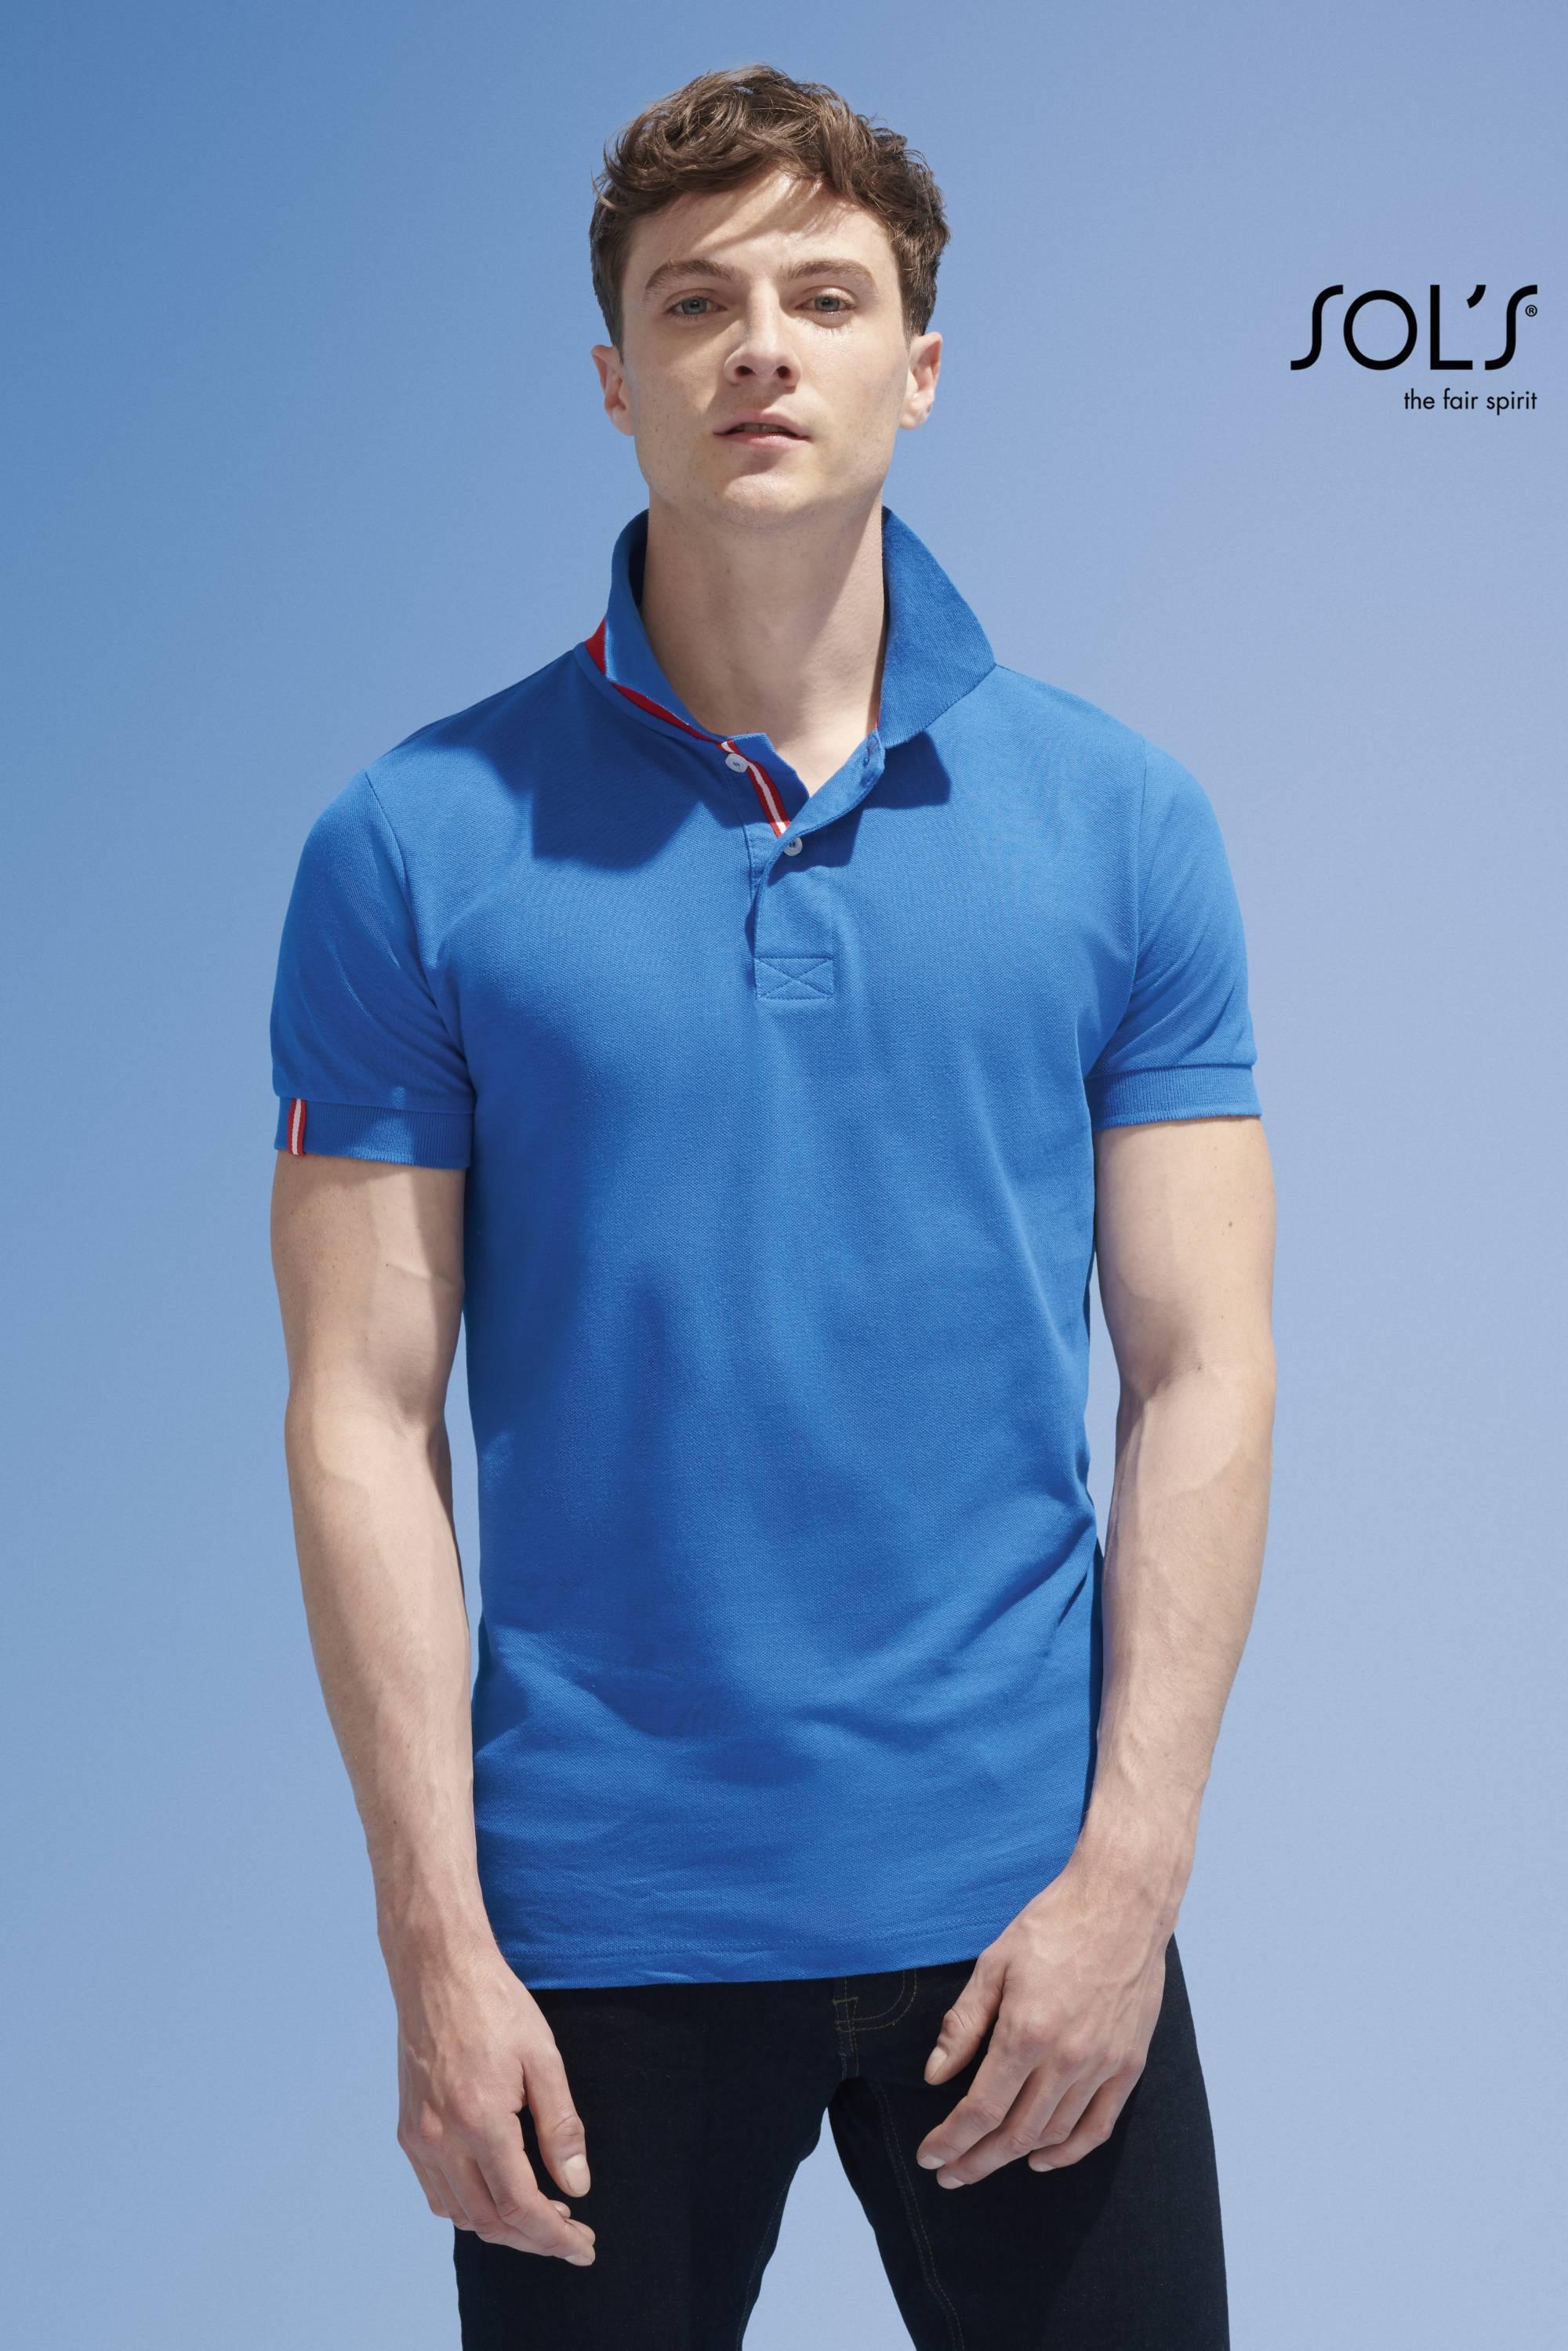 Sol 39 s polo patriot oficina da t shirt for Sol s t shirt